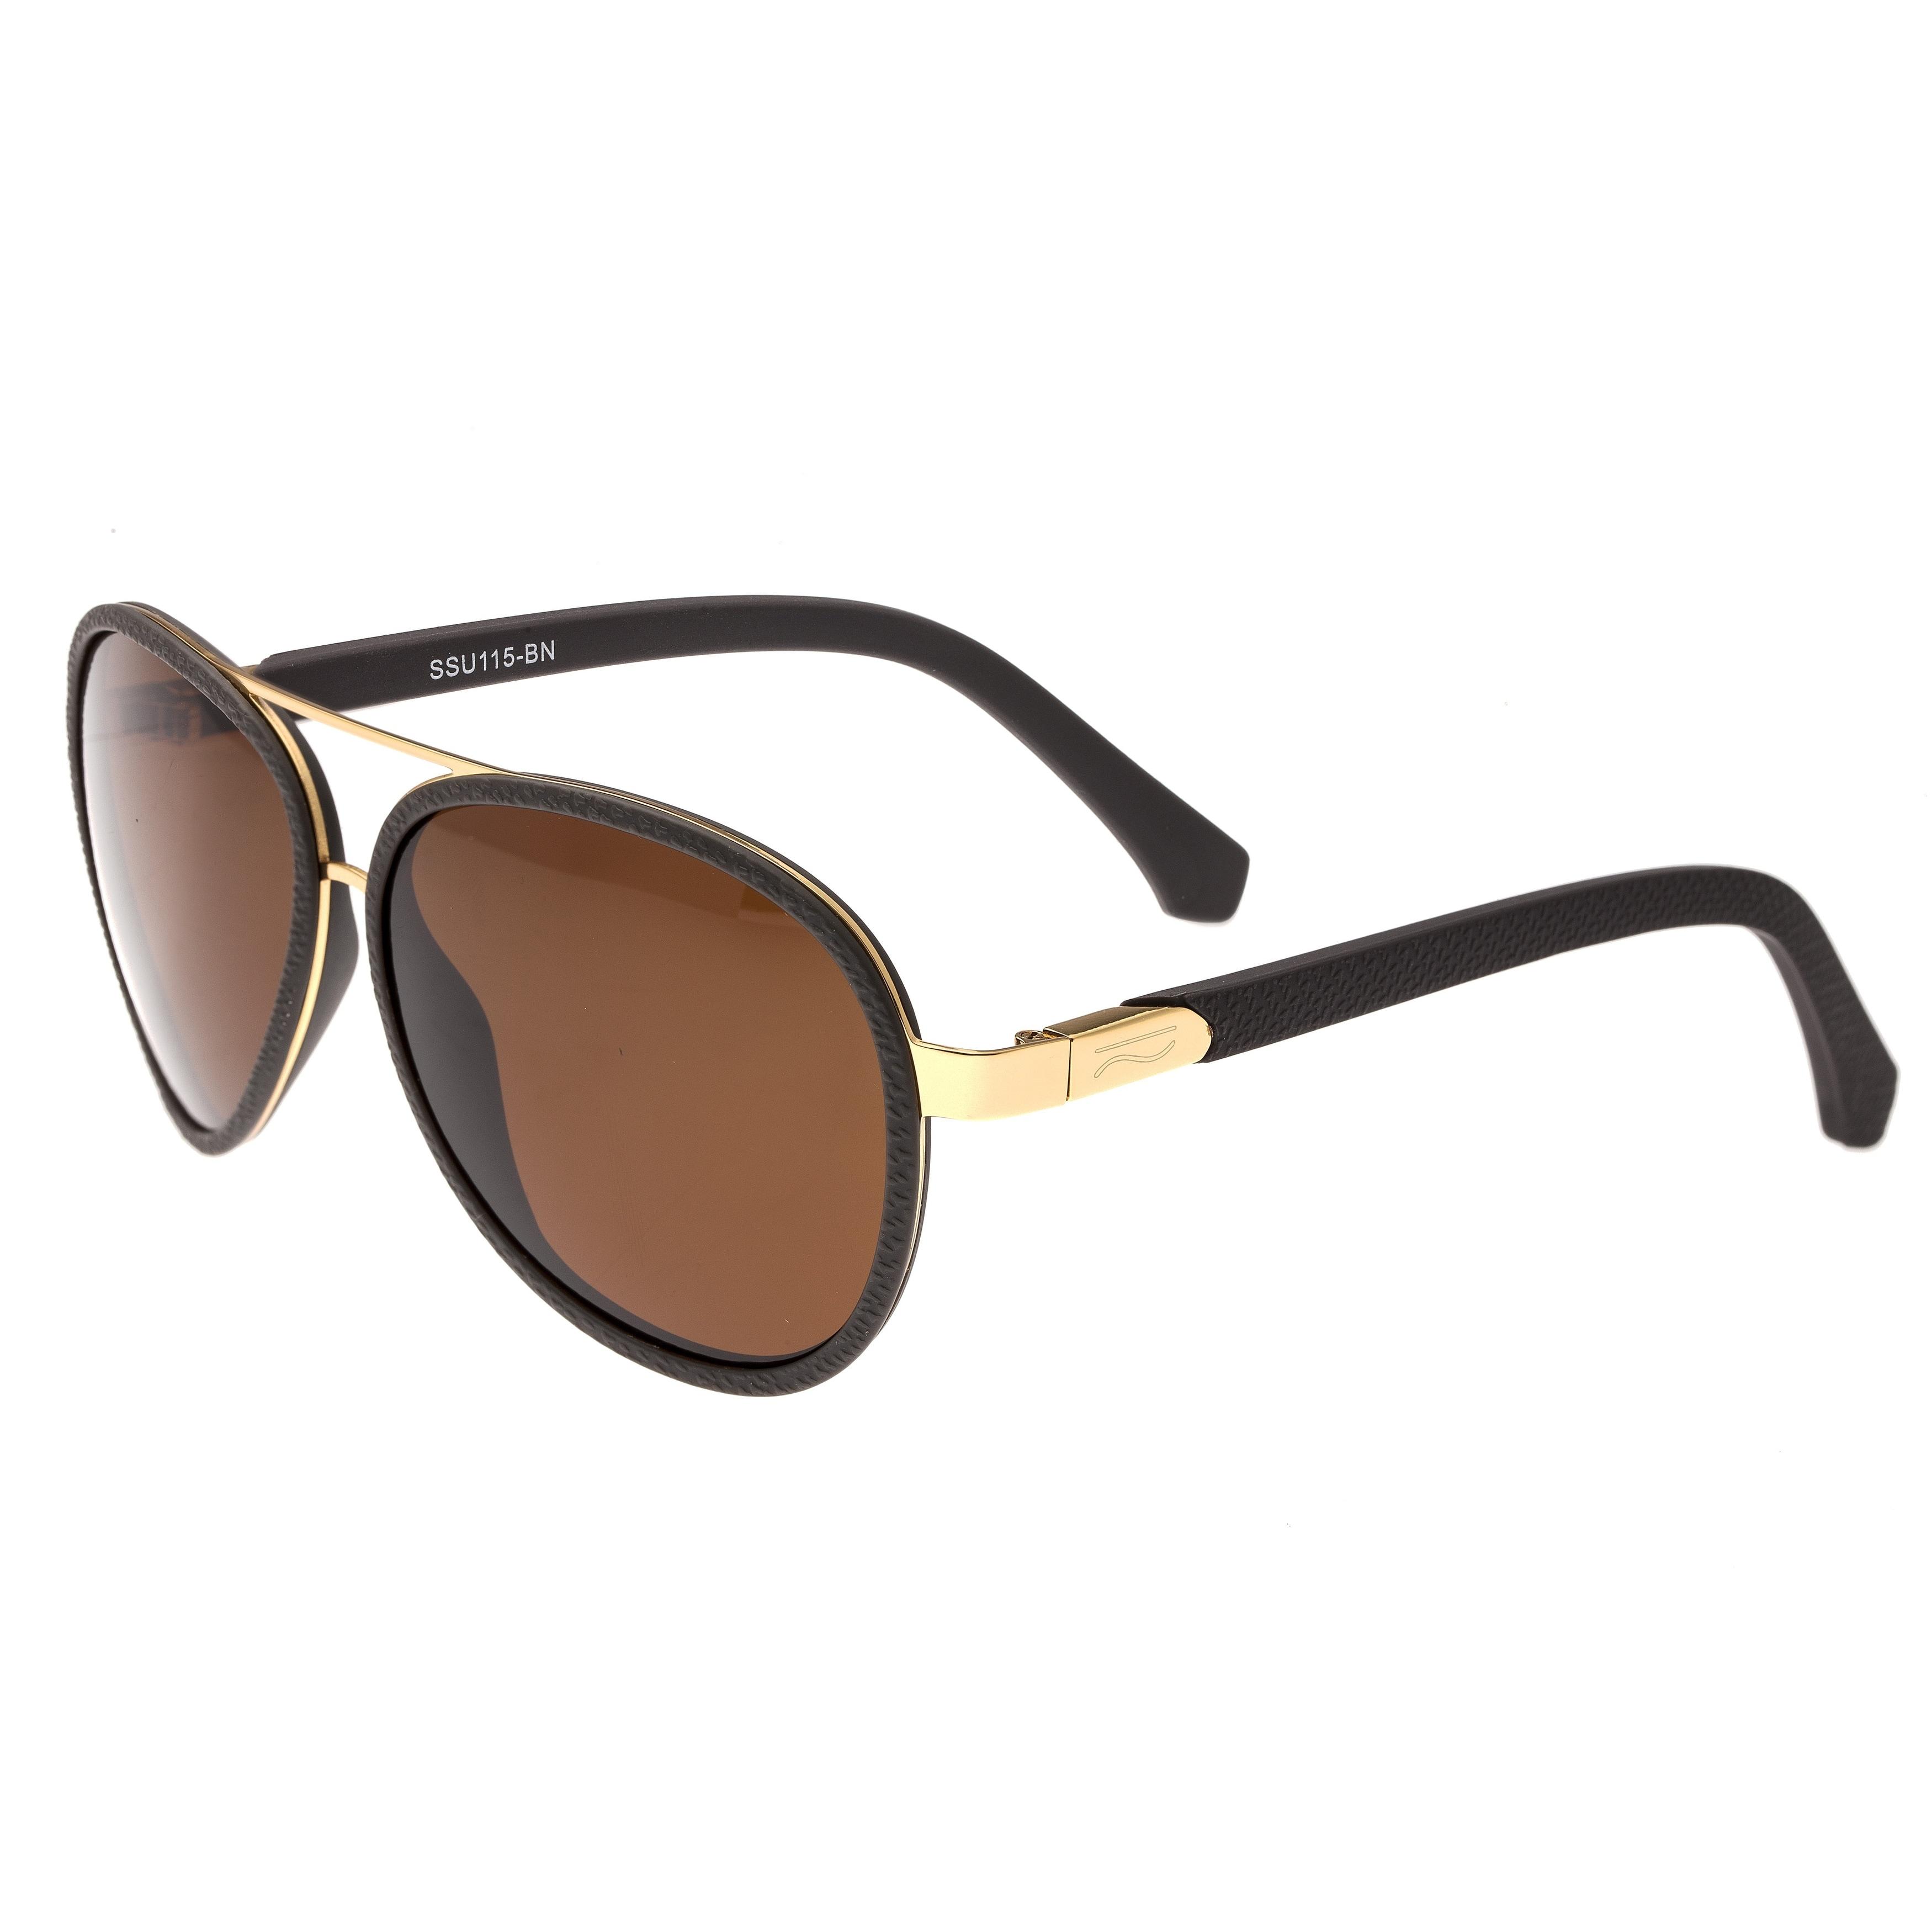 fff2ee0c853 Simplify Stanford Unisex Metal Sunglasses - 100% UVA UVB Prorection -  Polarized Lens - Multi